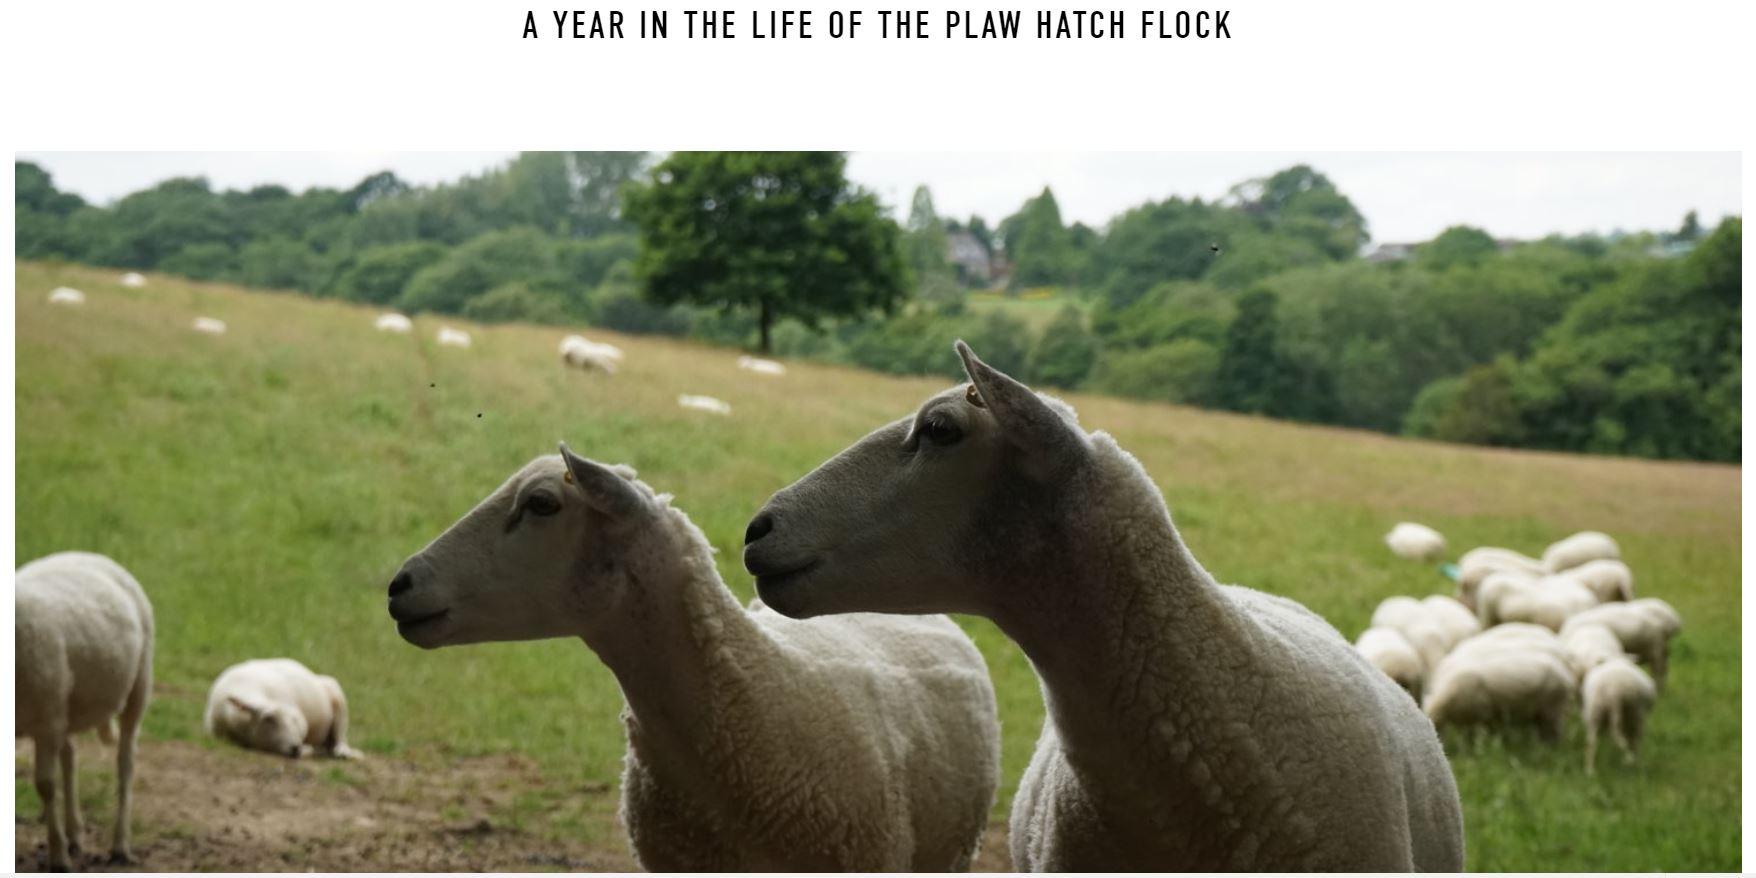 Plaw hatch flock for website.JPG